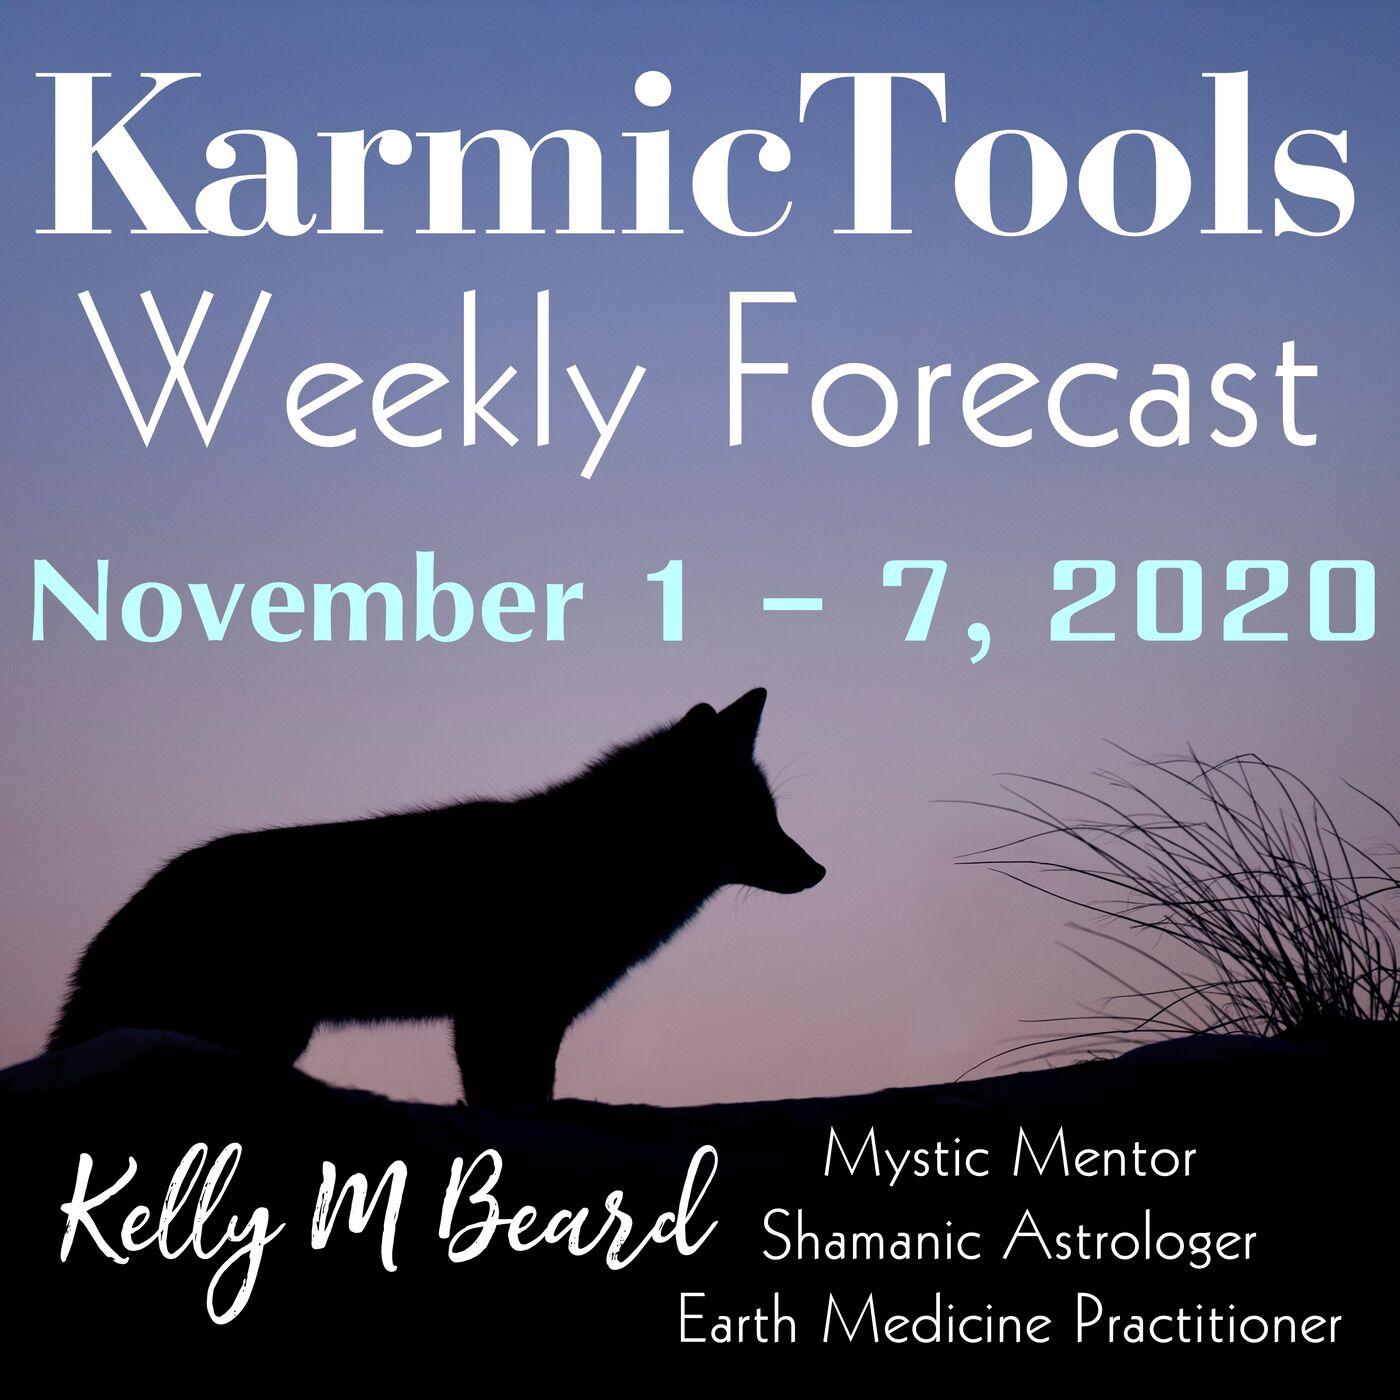 Nov 1 - 7, 2020 KarmicTools Weekly Forecast